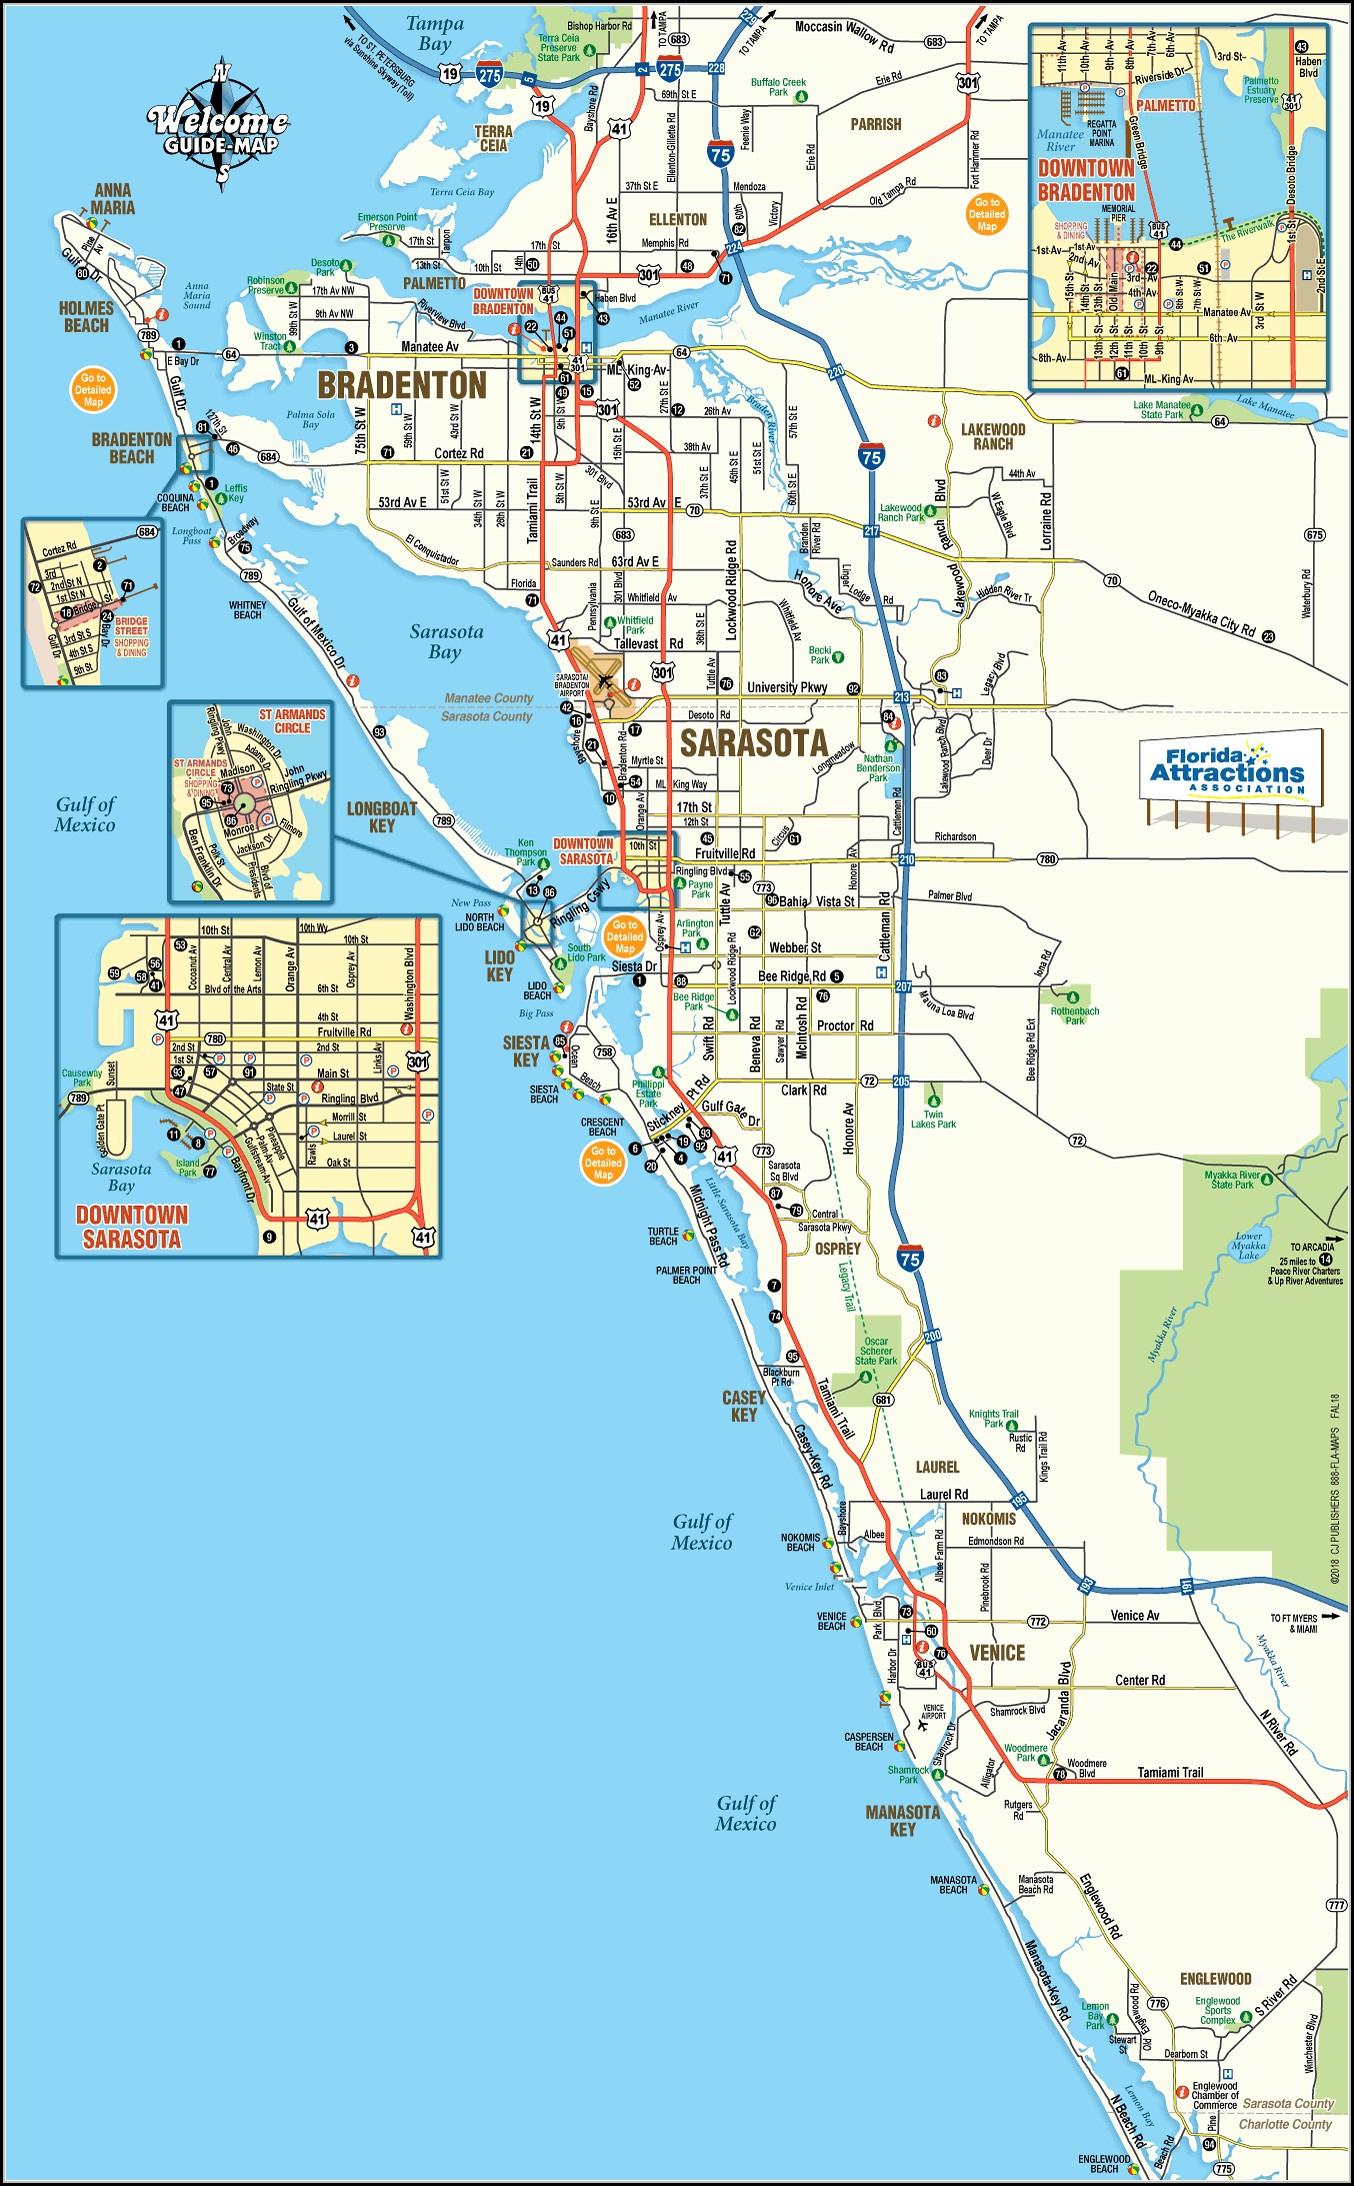 Map Of Sarasota Florida - Map : Resume Examples #ygkzkd53P9 - Where Is Sarasota Florida On The Map